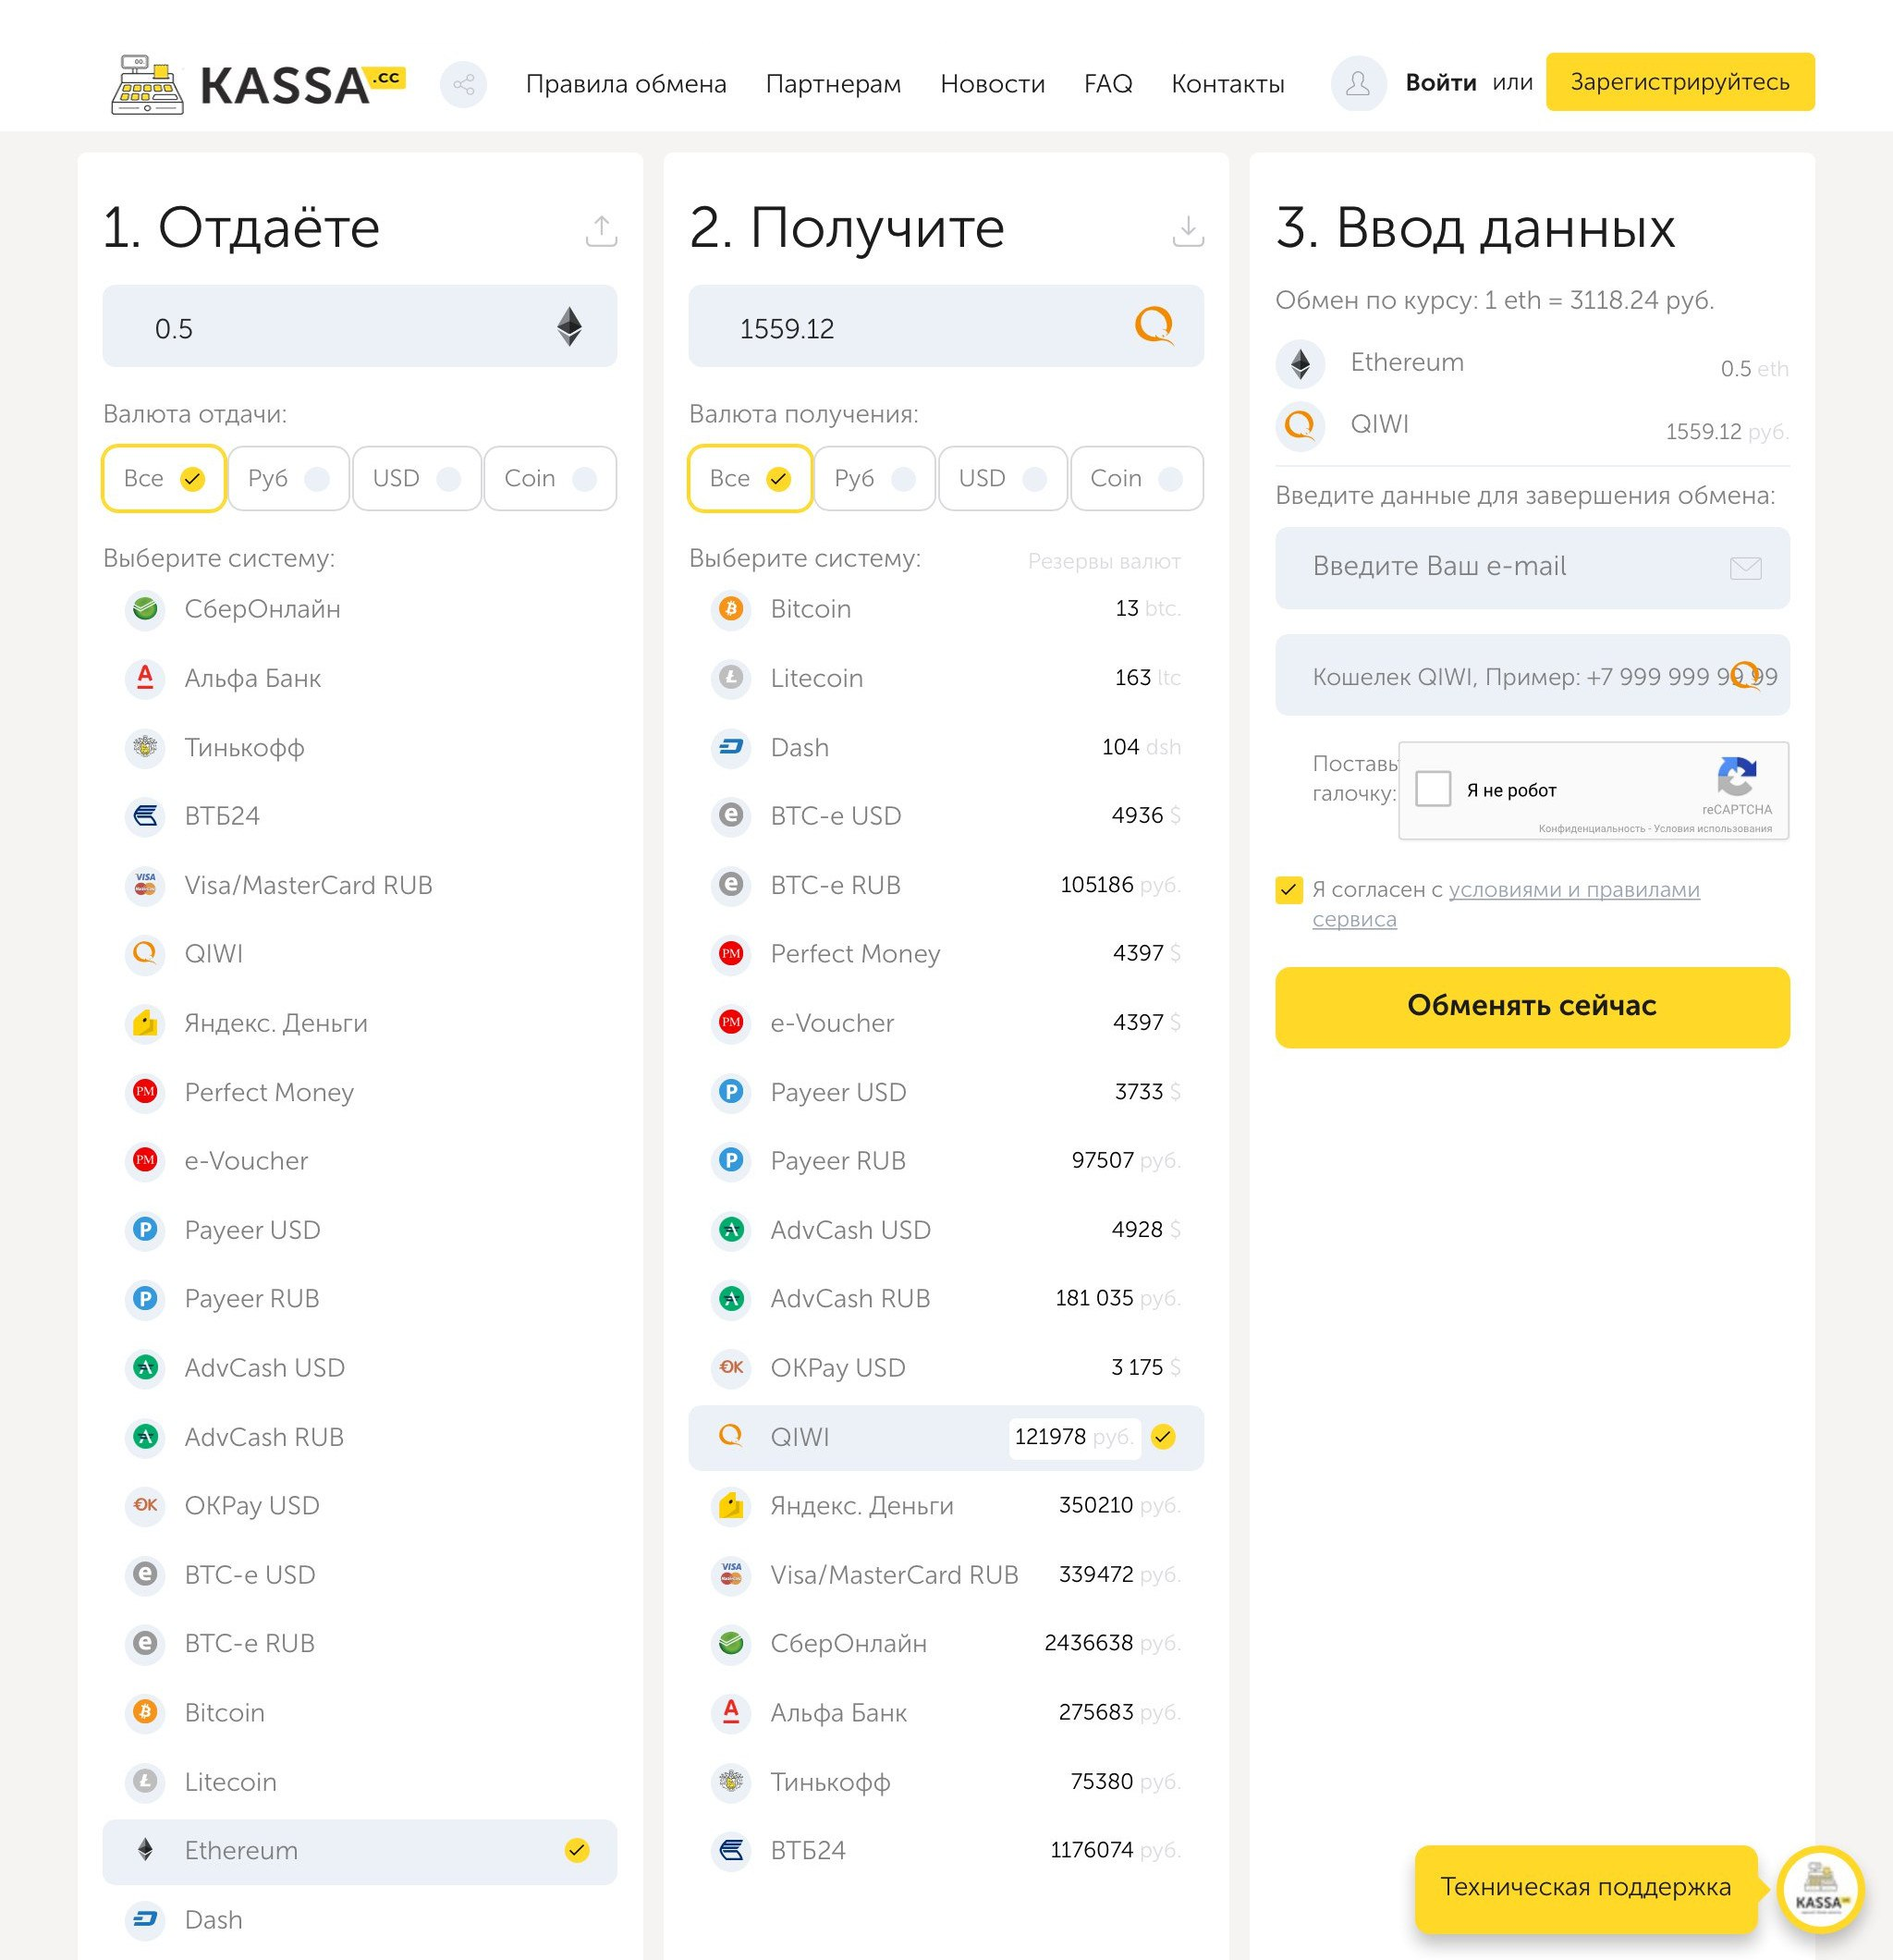 Kassa.cc is a single currency exchange. Exchange Ethereum for QIWI RUB